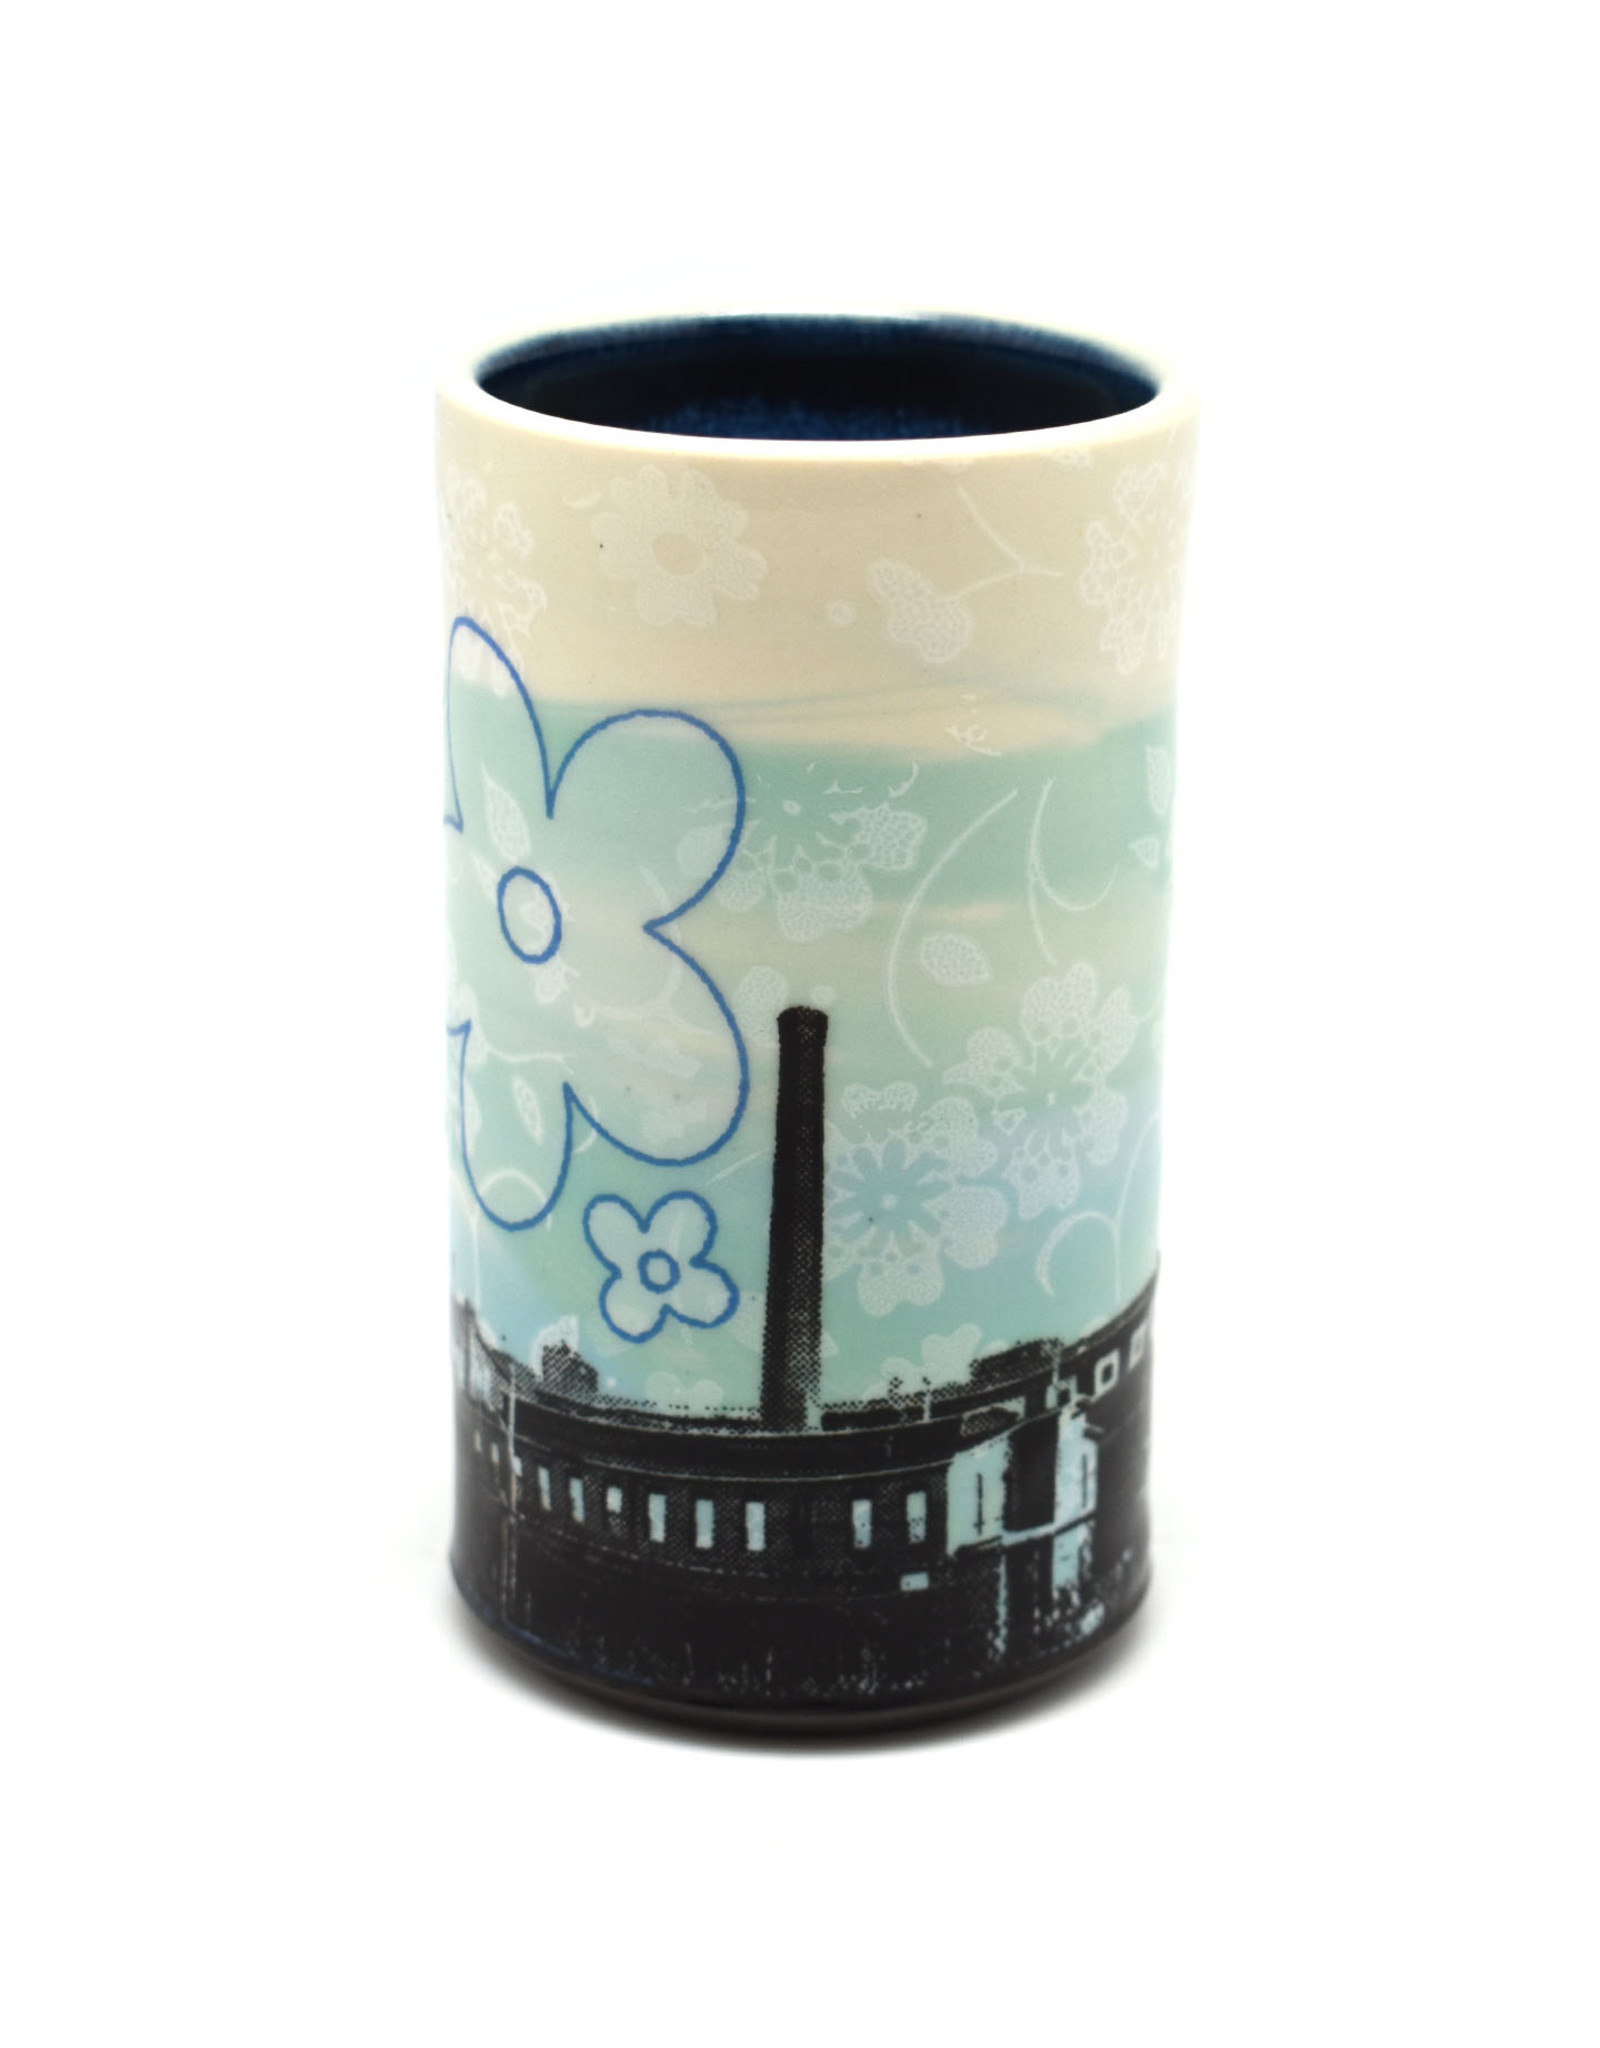 Mill Thirsty Mug - Tall